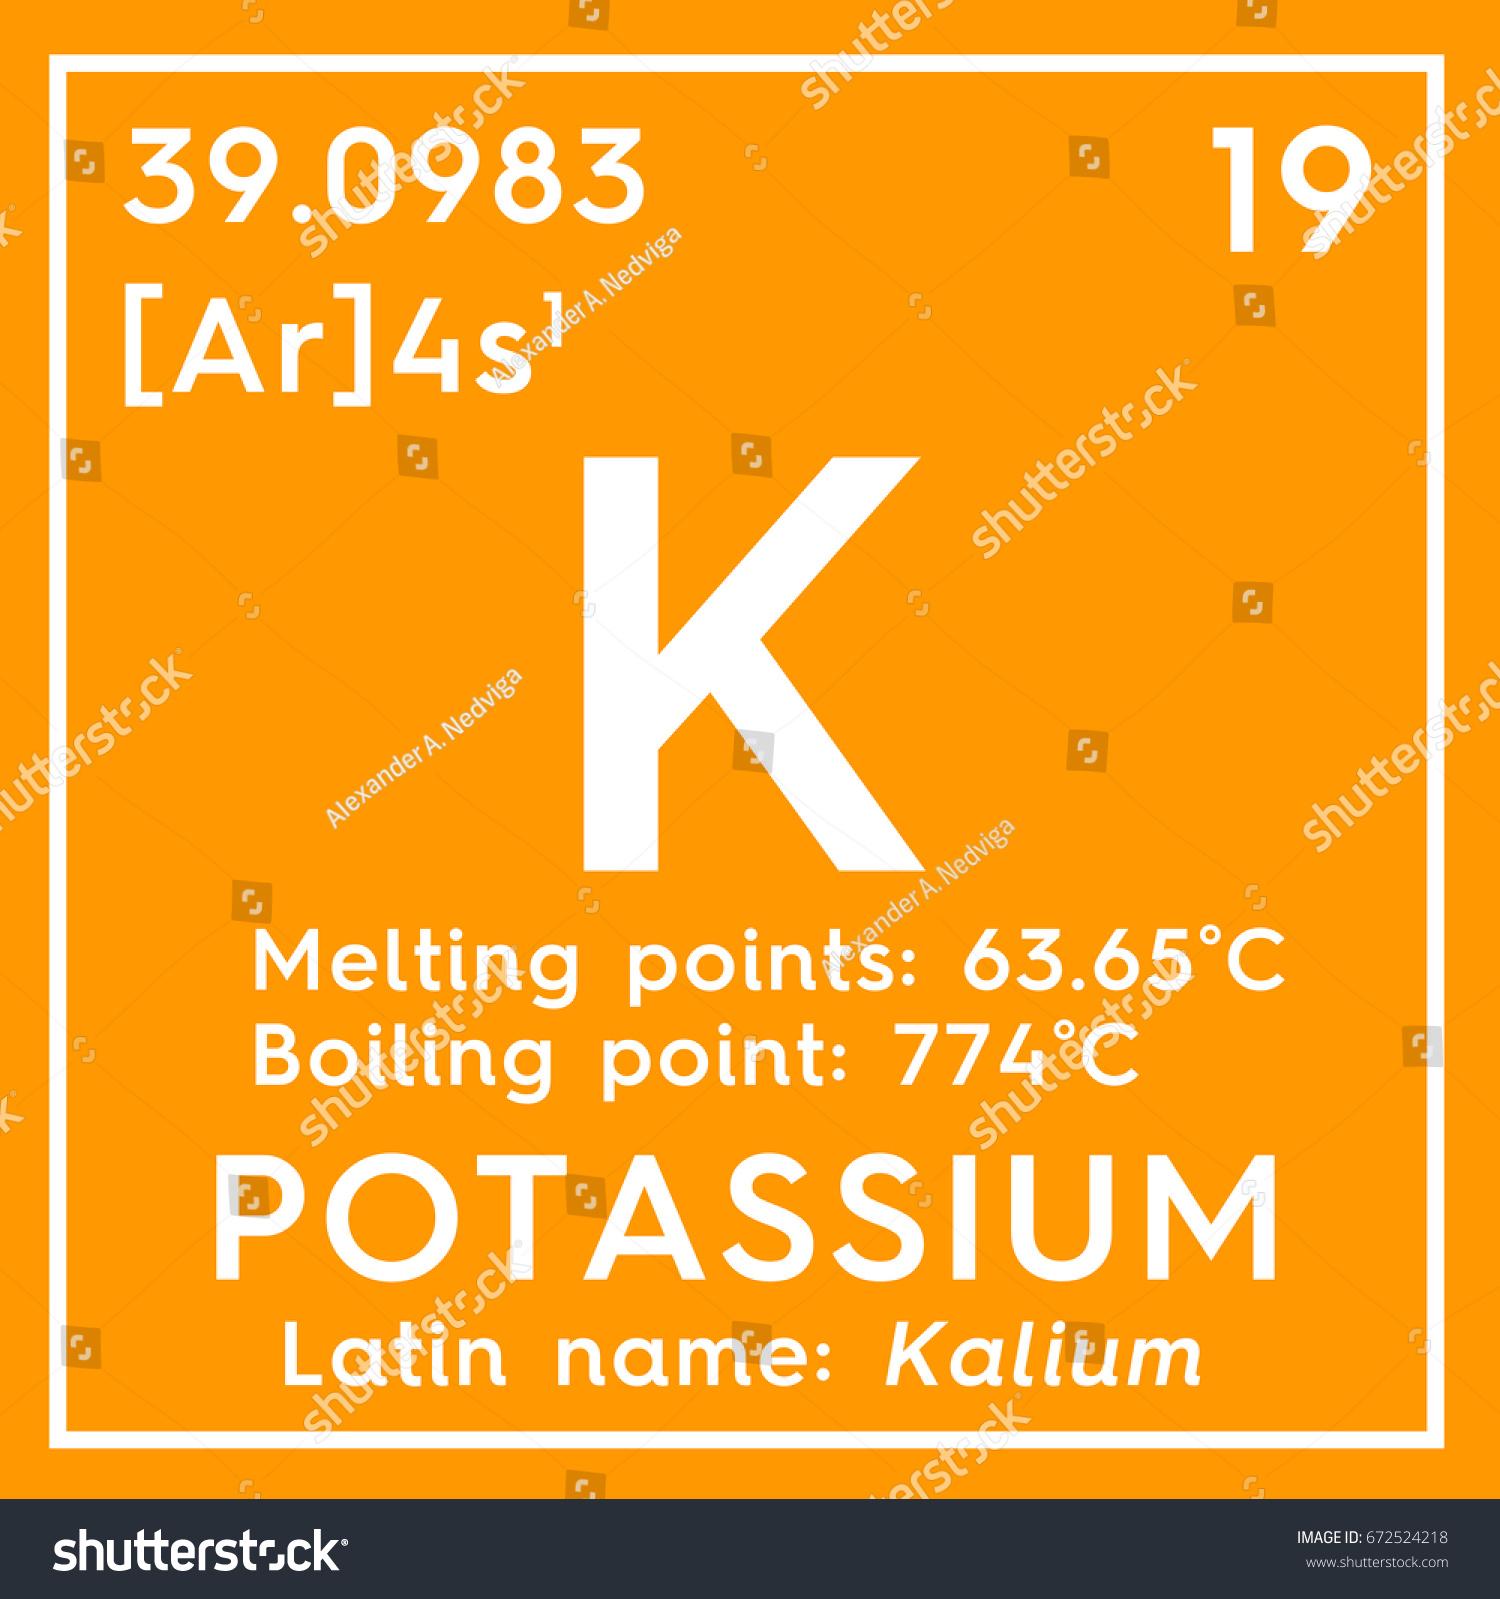 Potassium kalium alkali metals chemical element stock illustration potassium kalium alkali metals chemical element stock illustration 672524218 shutterstock urtaz Gallery